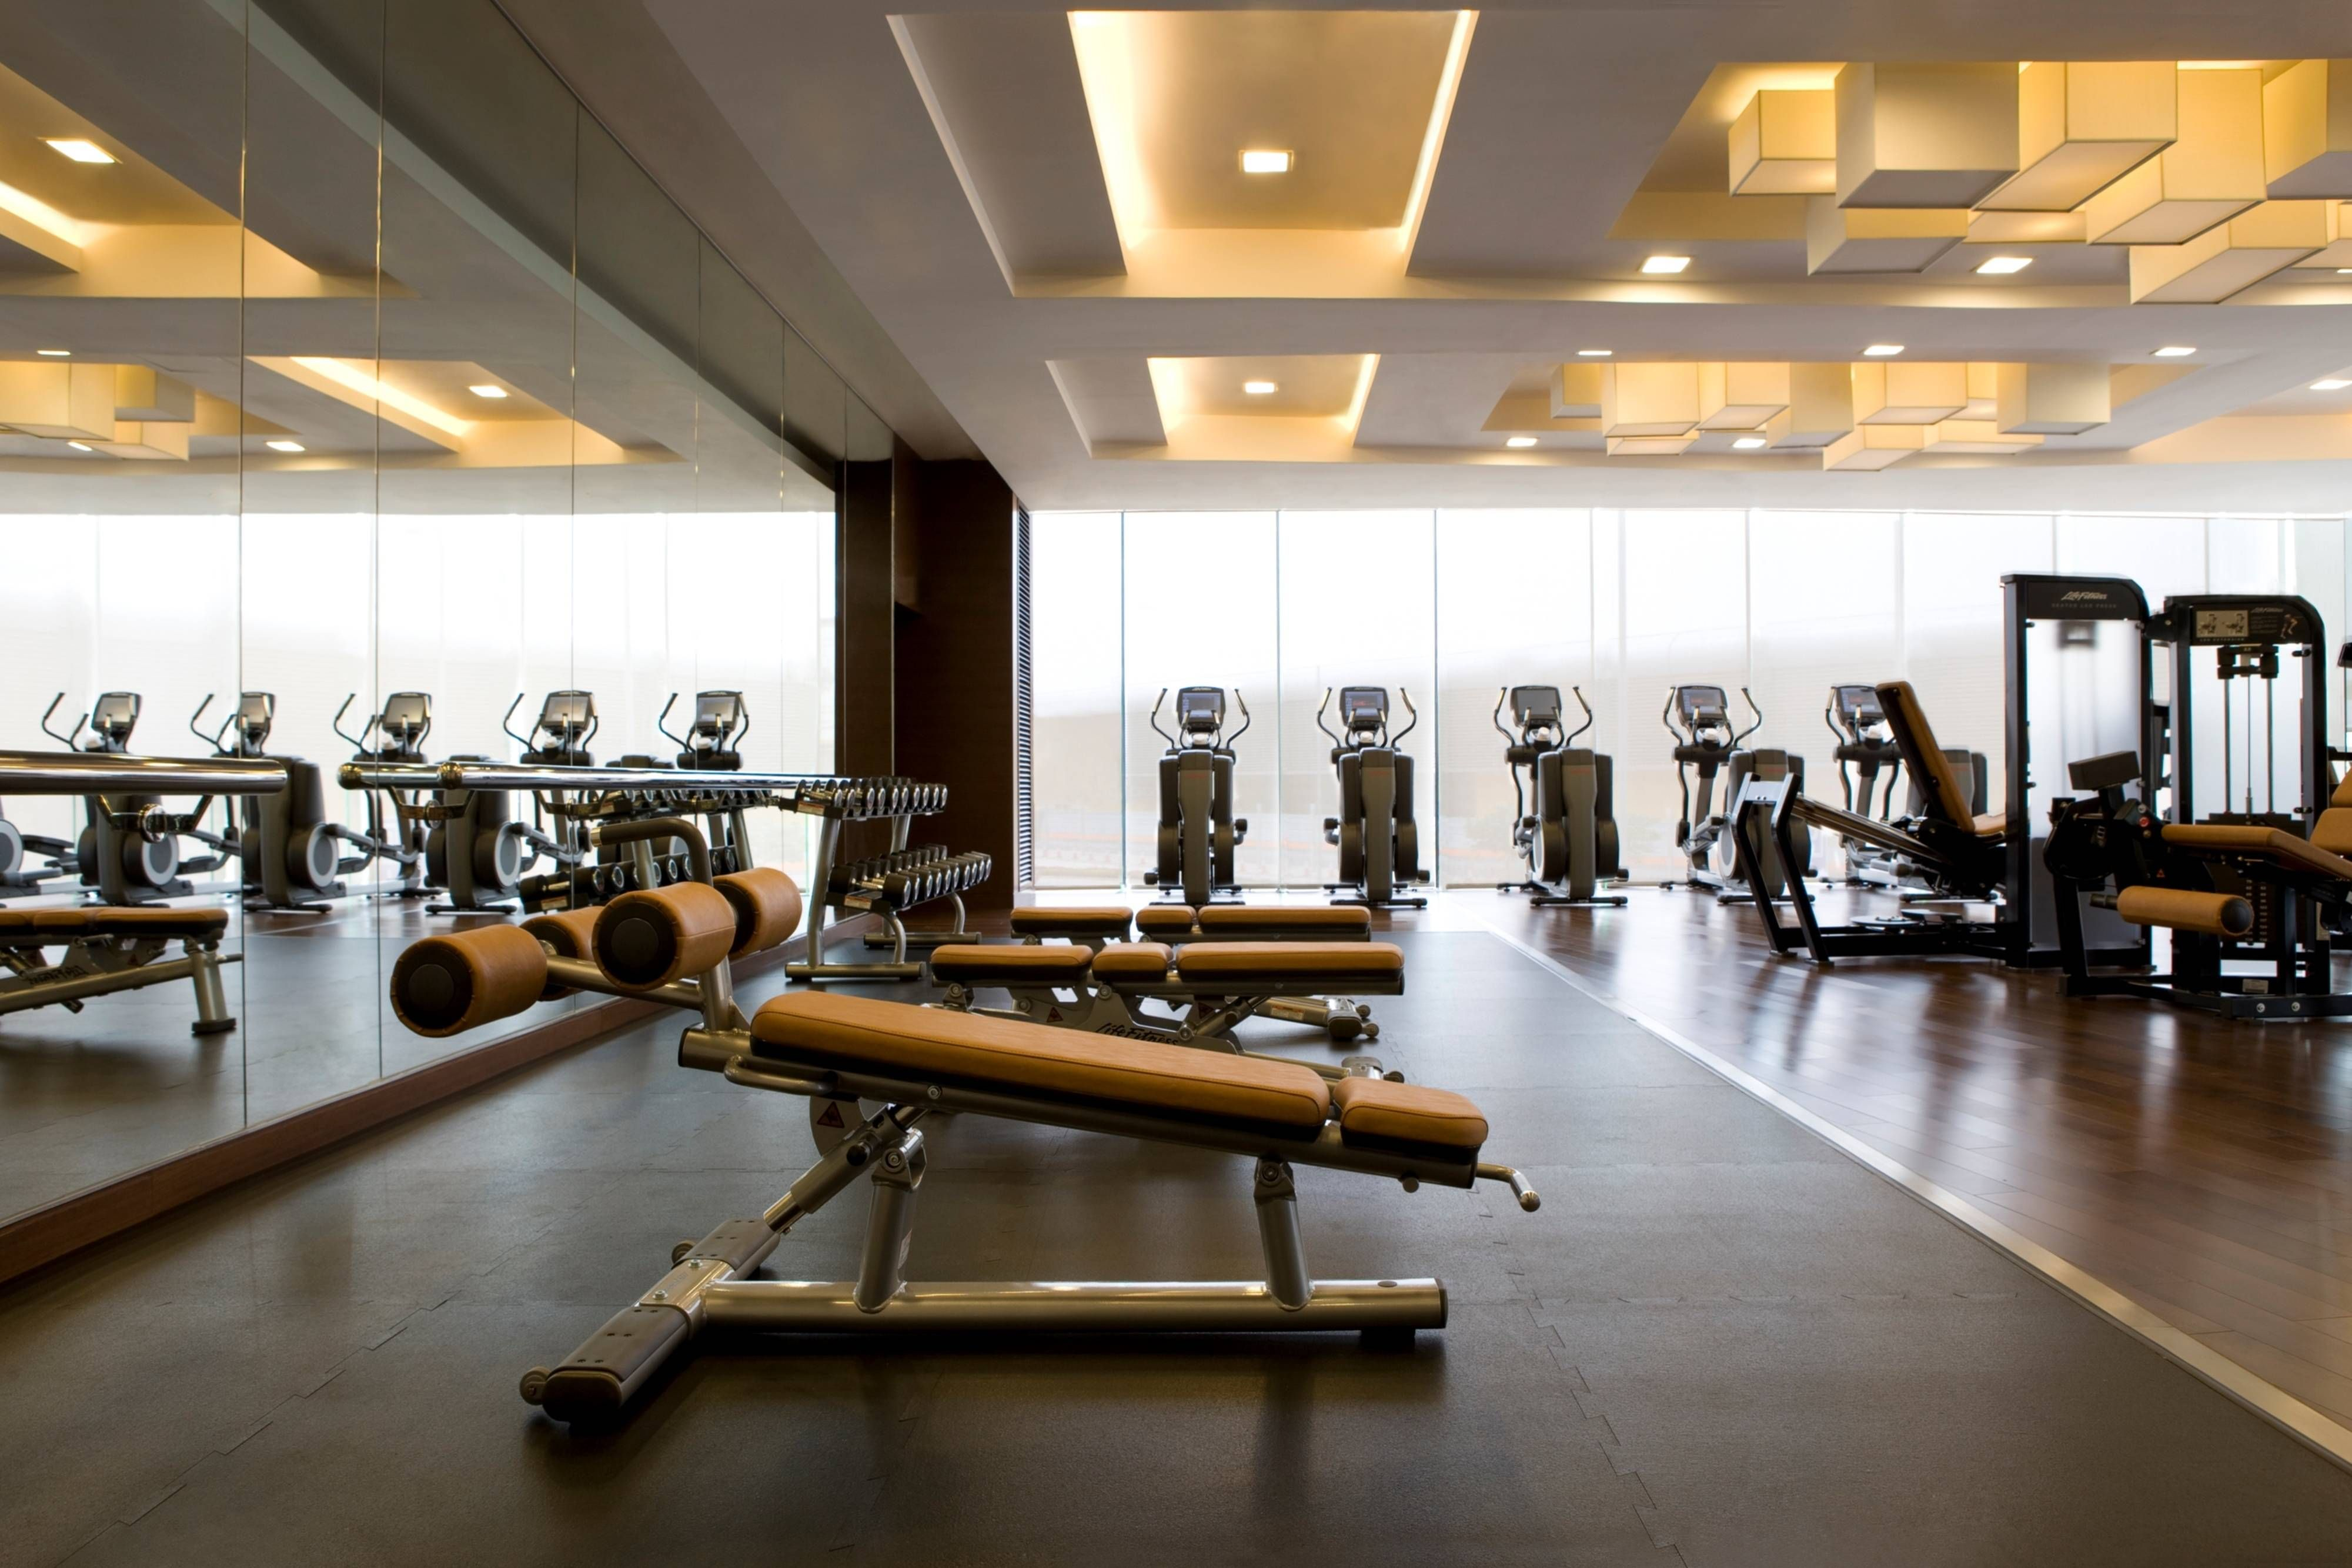 Hong Kong Skycity Marriott Hotel Fitness Center Suite Enjoying Visiting Gym Interior Fitness Center Design Luxury Gym